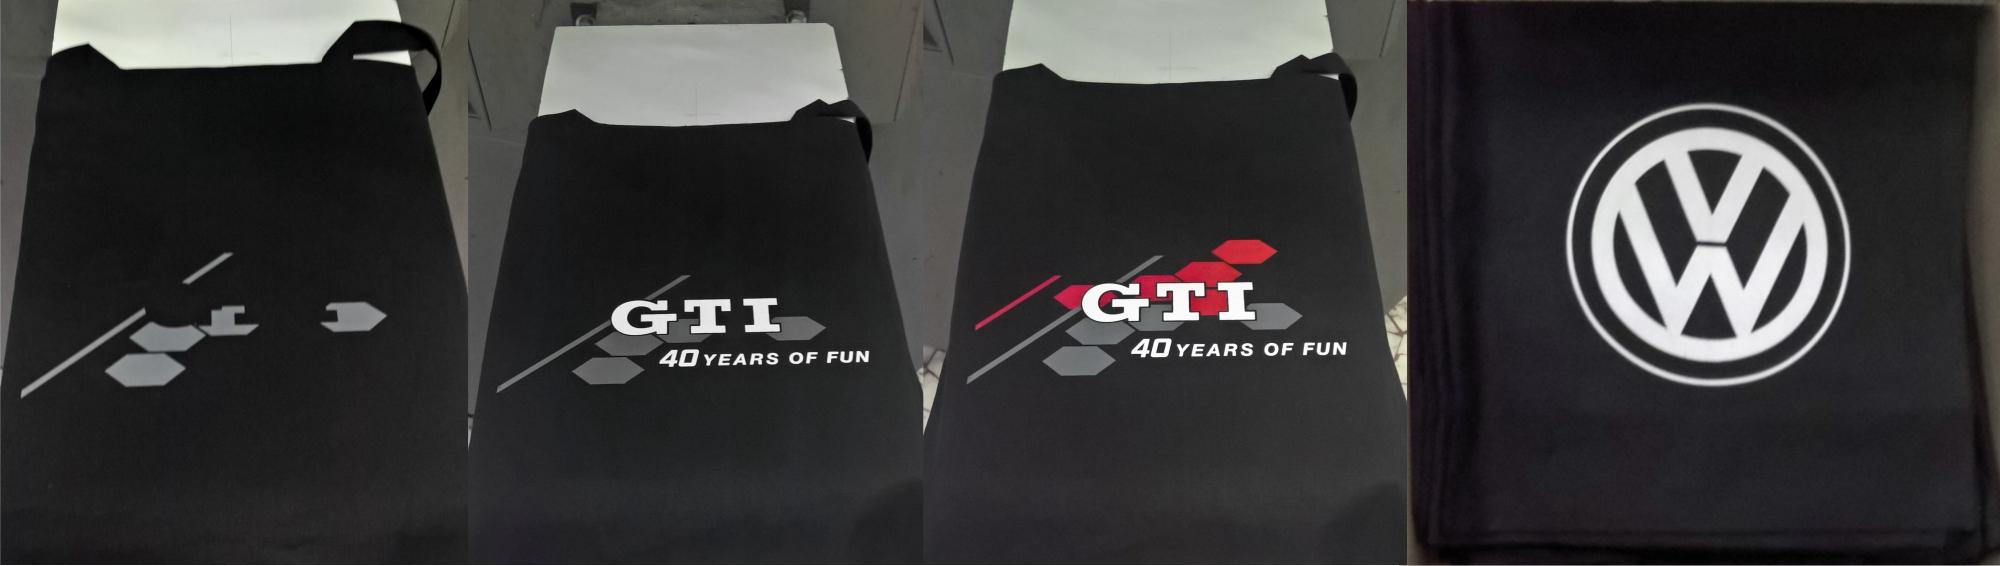 VW GTI shopping bag 1+3col